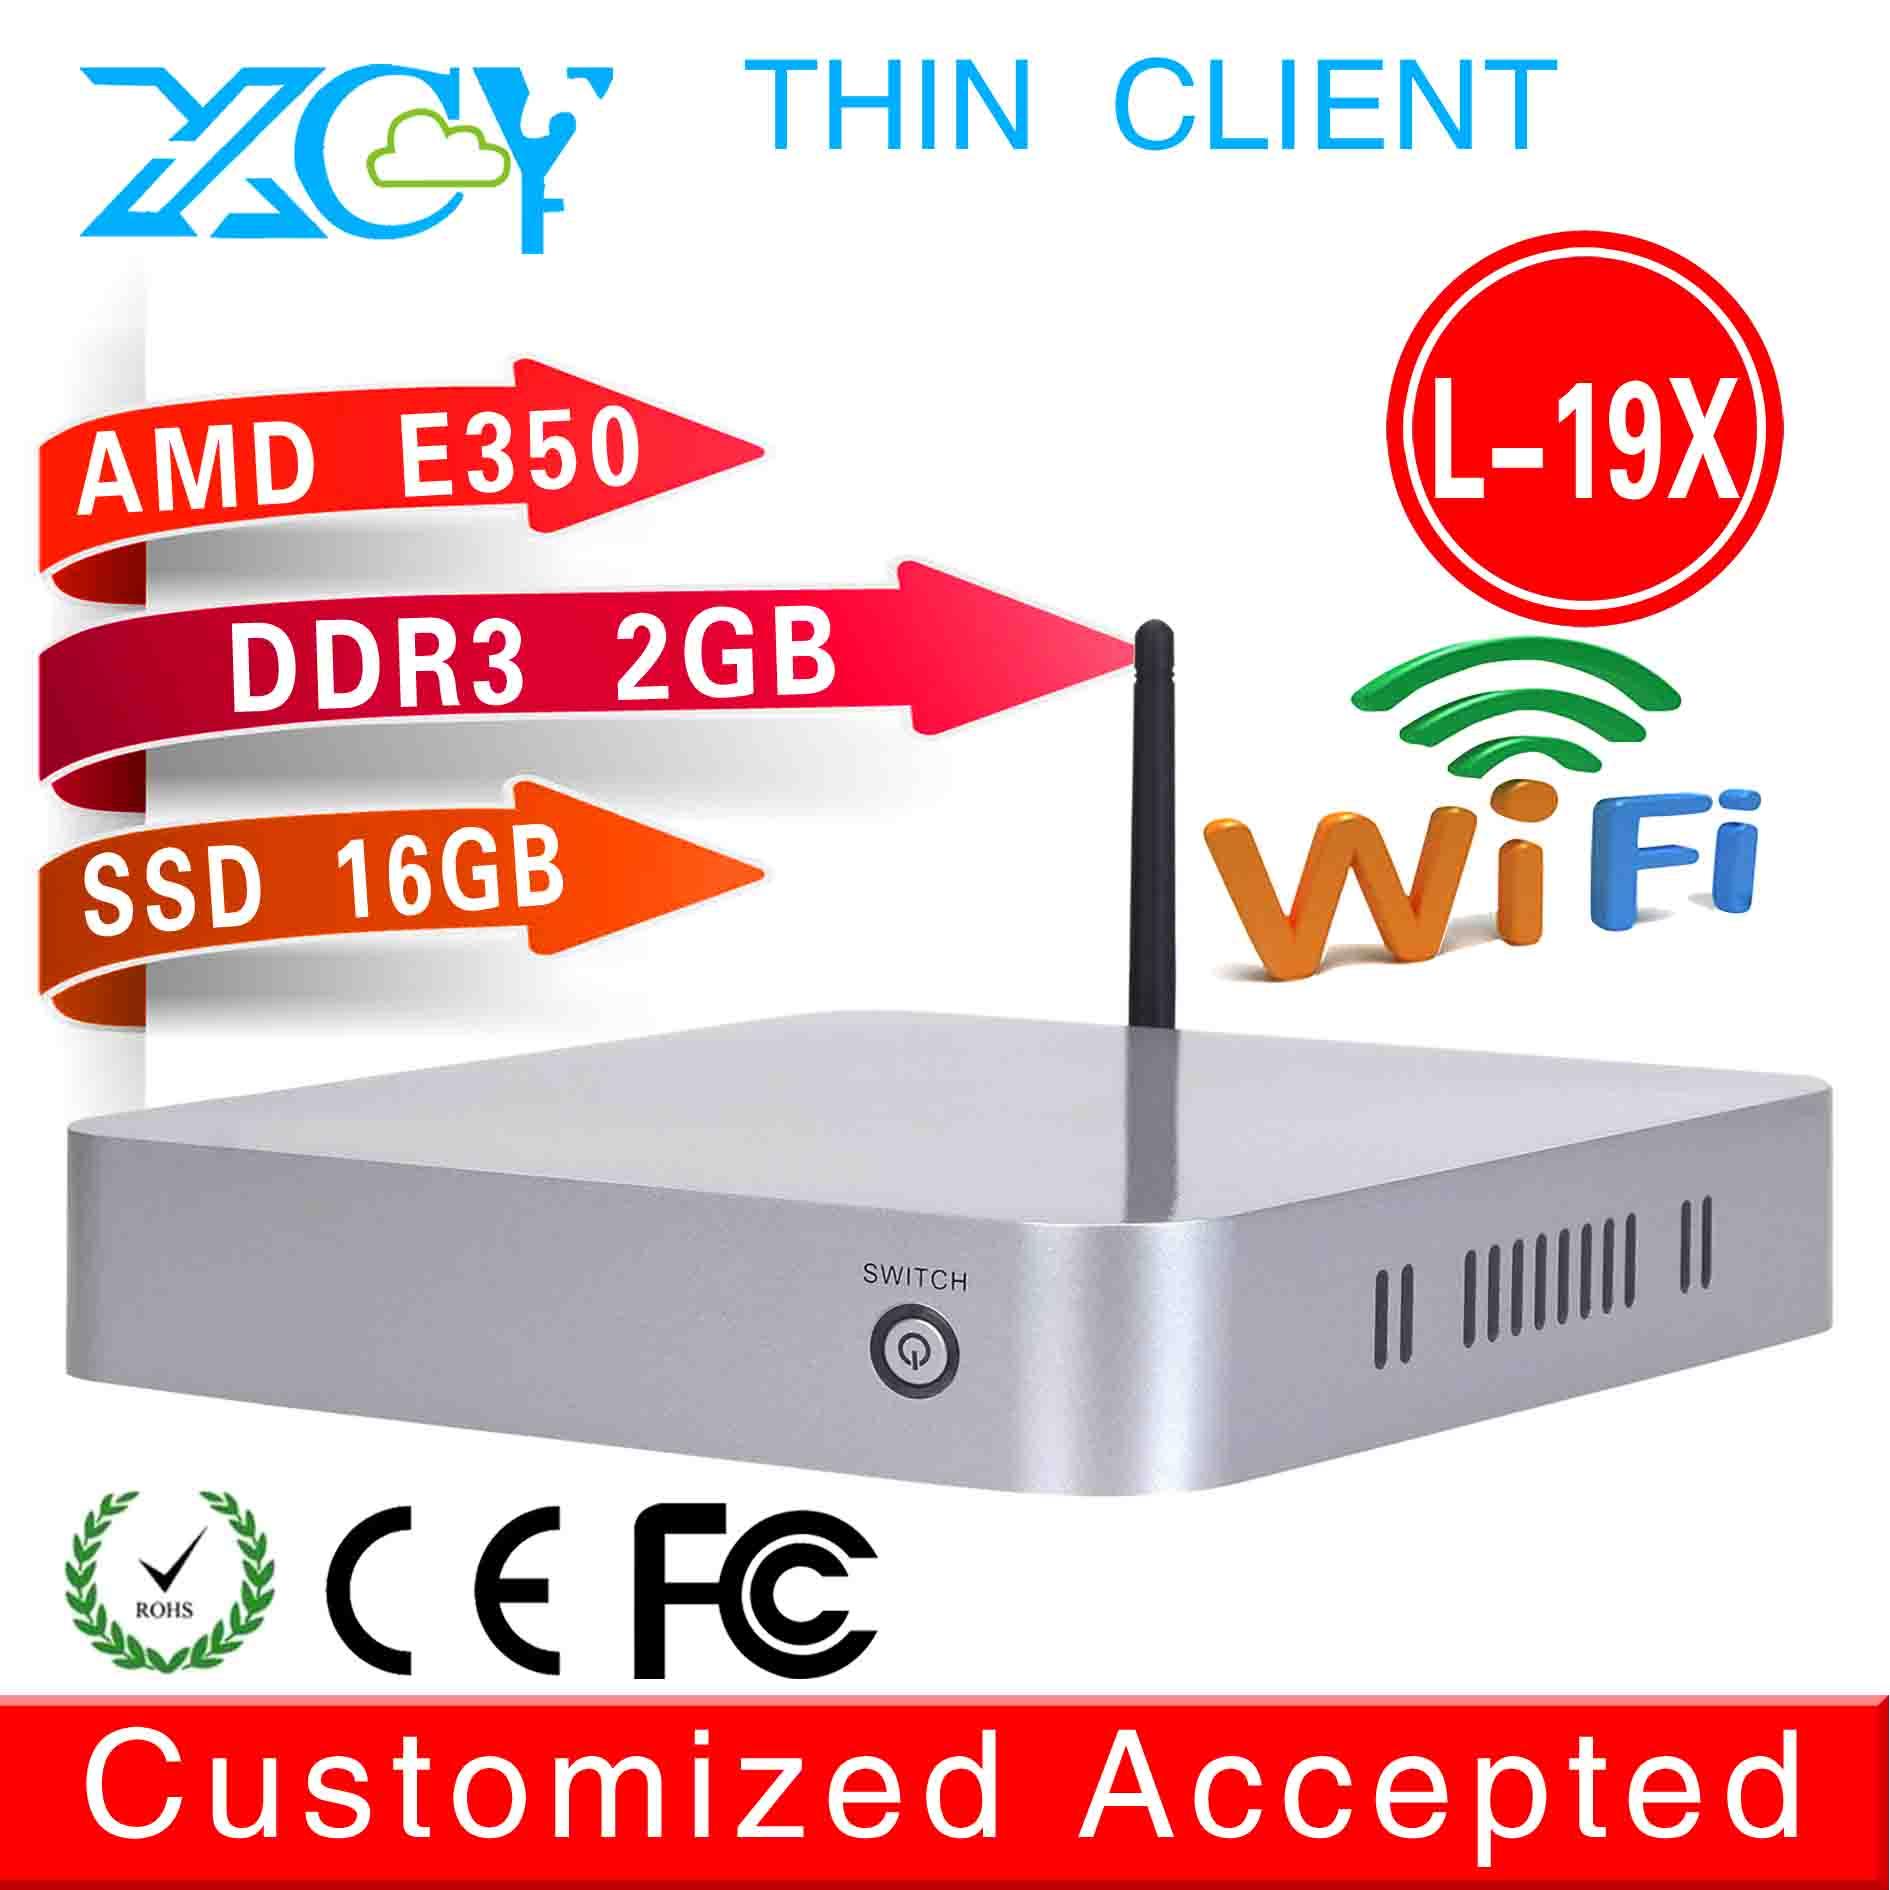 small body best quality low heat mini computer l-19x mini industrial pc AMD E350 network fan desktop 2g ram 16g ssd thin client(China (Mainland))